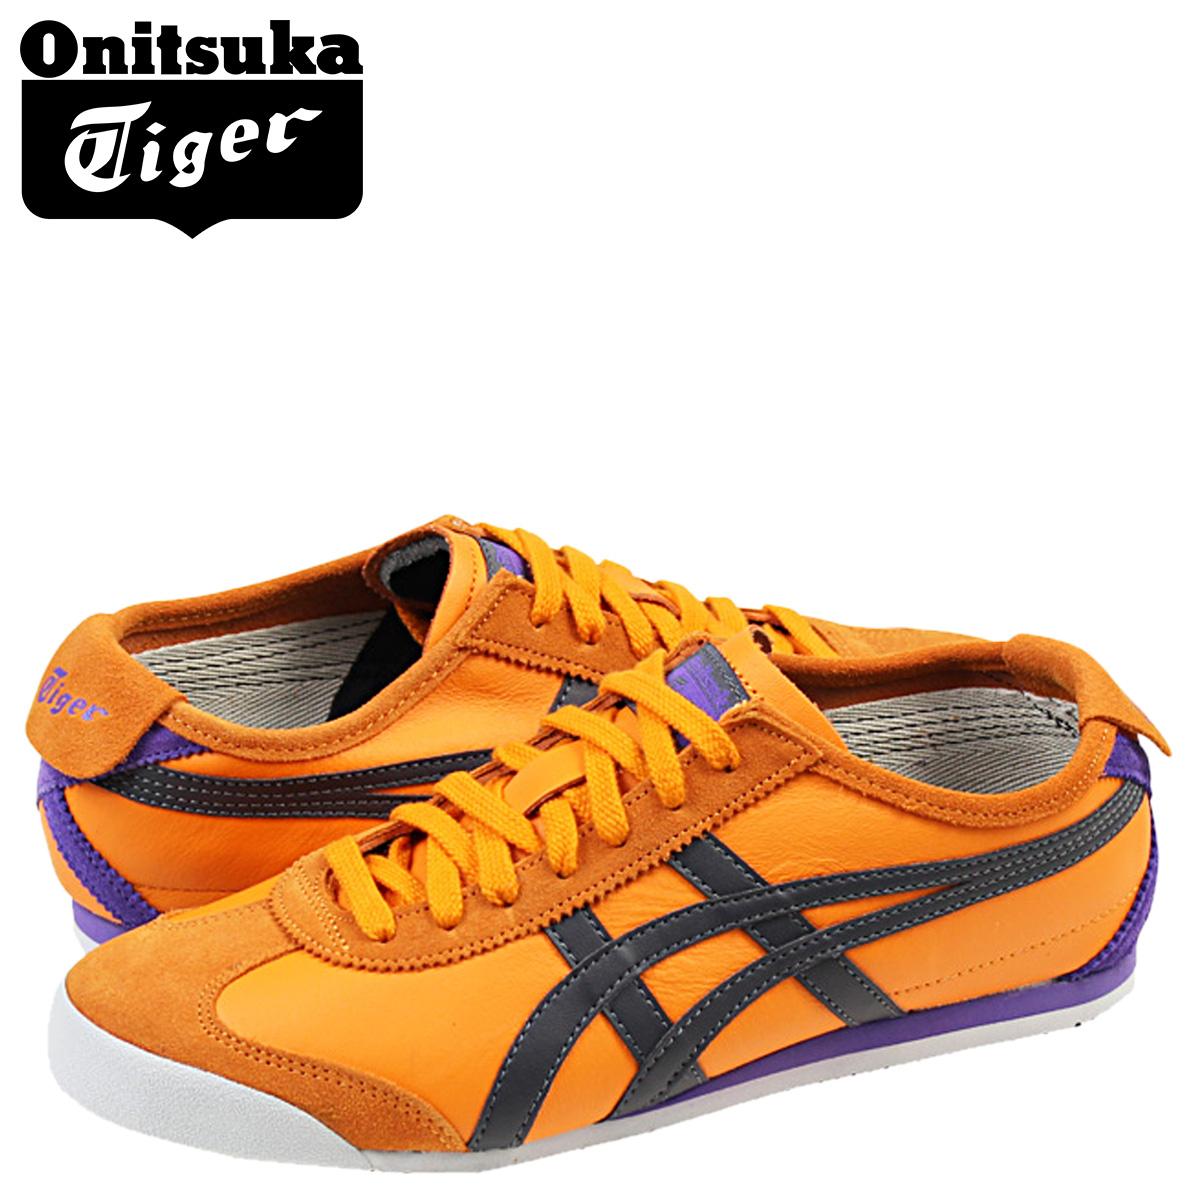 on sale c5df0 a1355 Sugar Online Shop: Onitsuka tiger ASICS Onitsuka Tiger asics ...